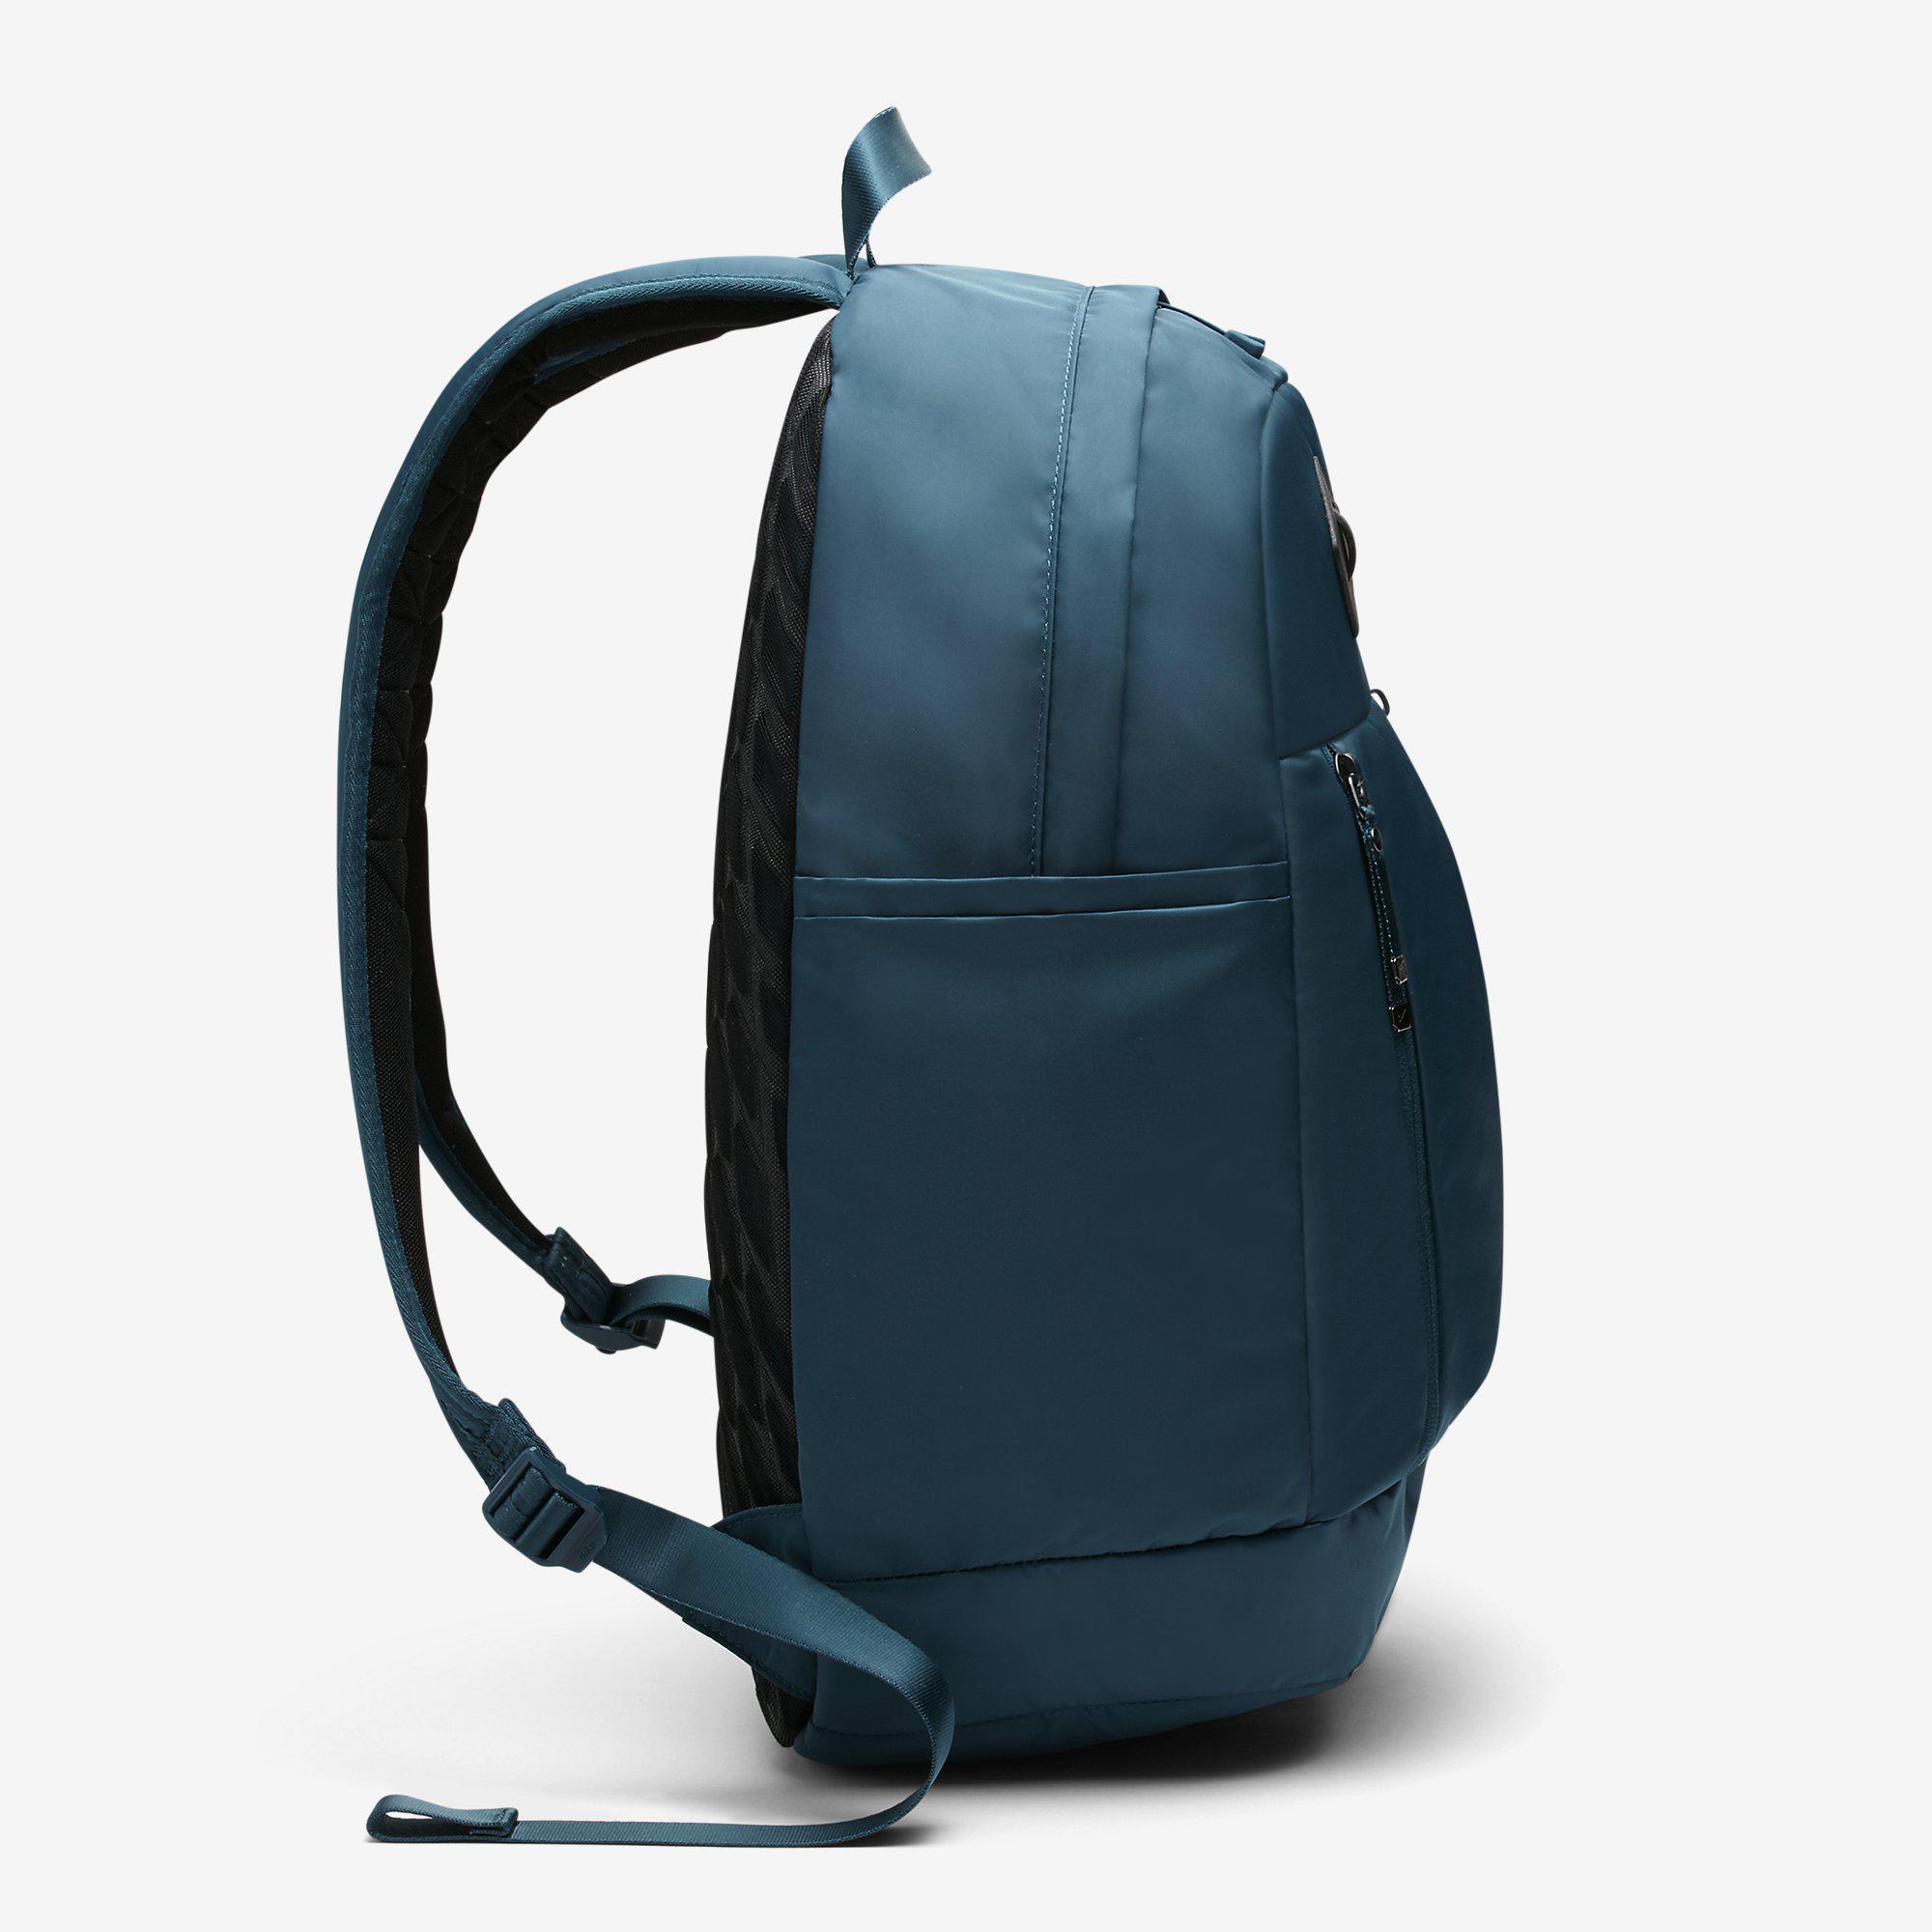 a60fdf8adf Nike Womens Auralux Printed Training Backpack - Blue - Tennisnuts.com